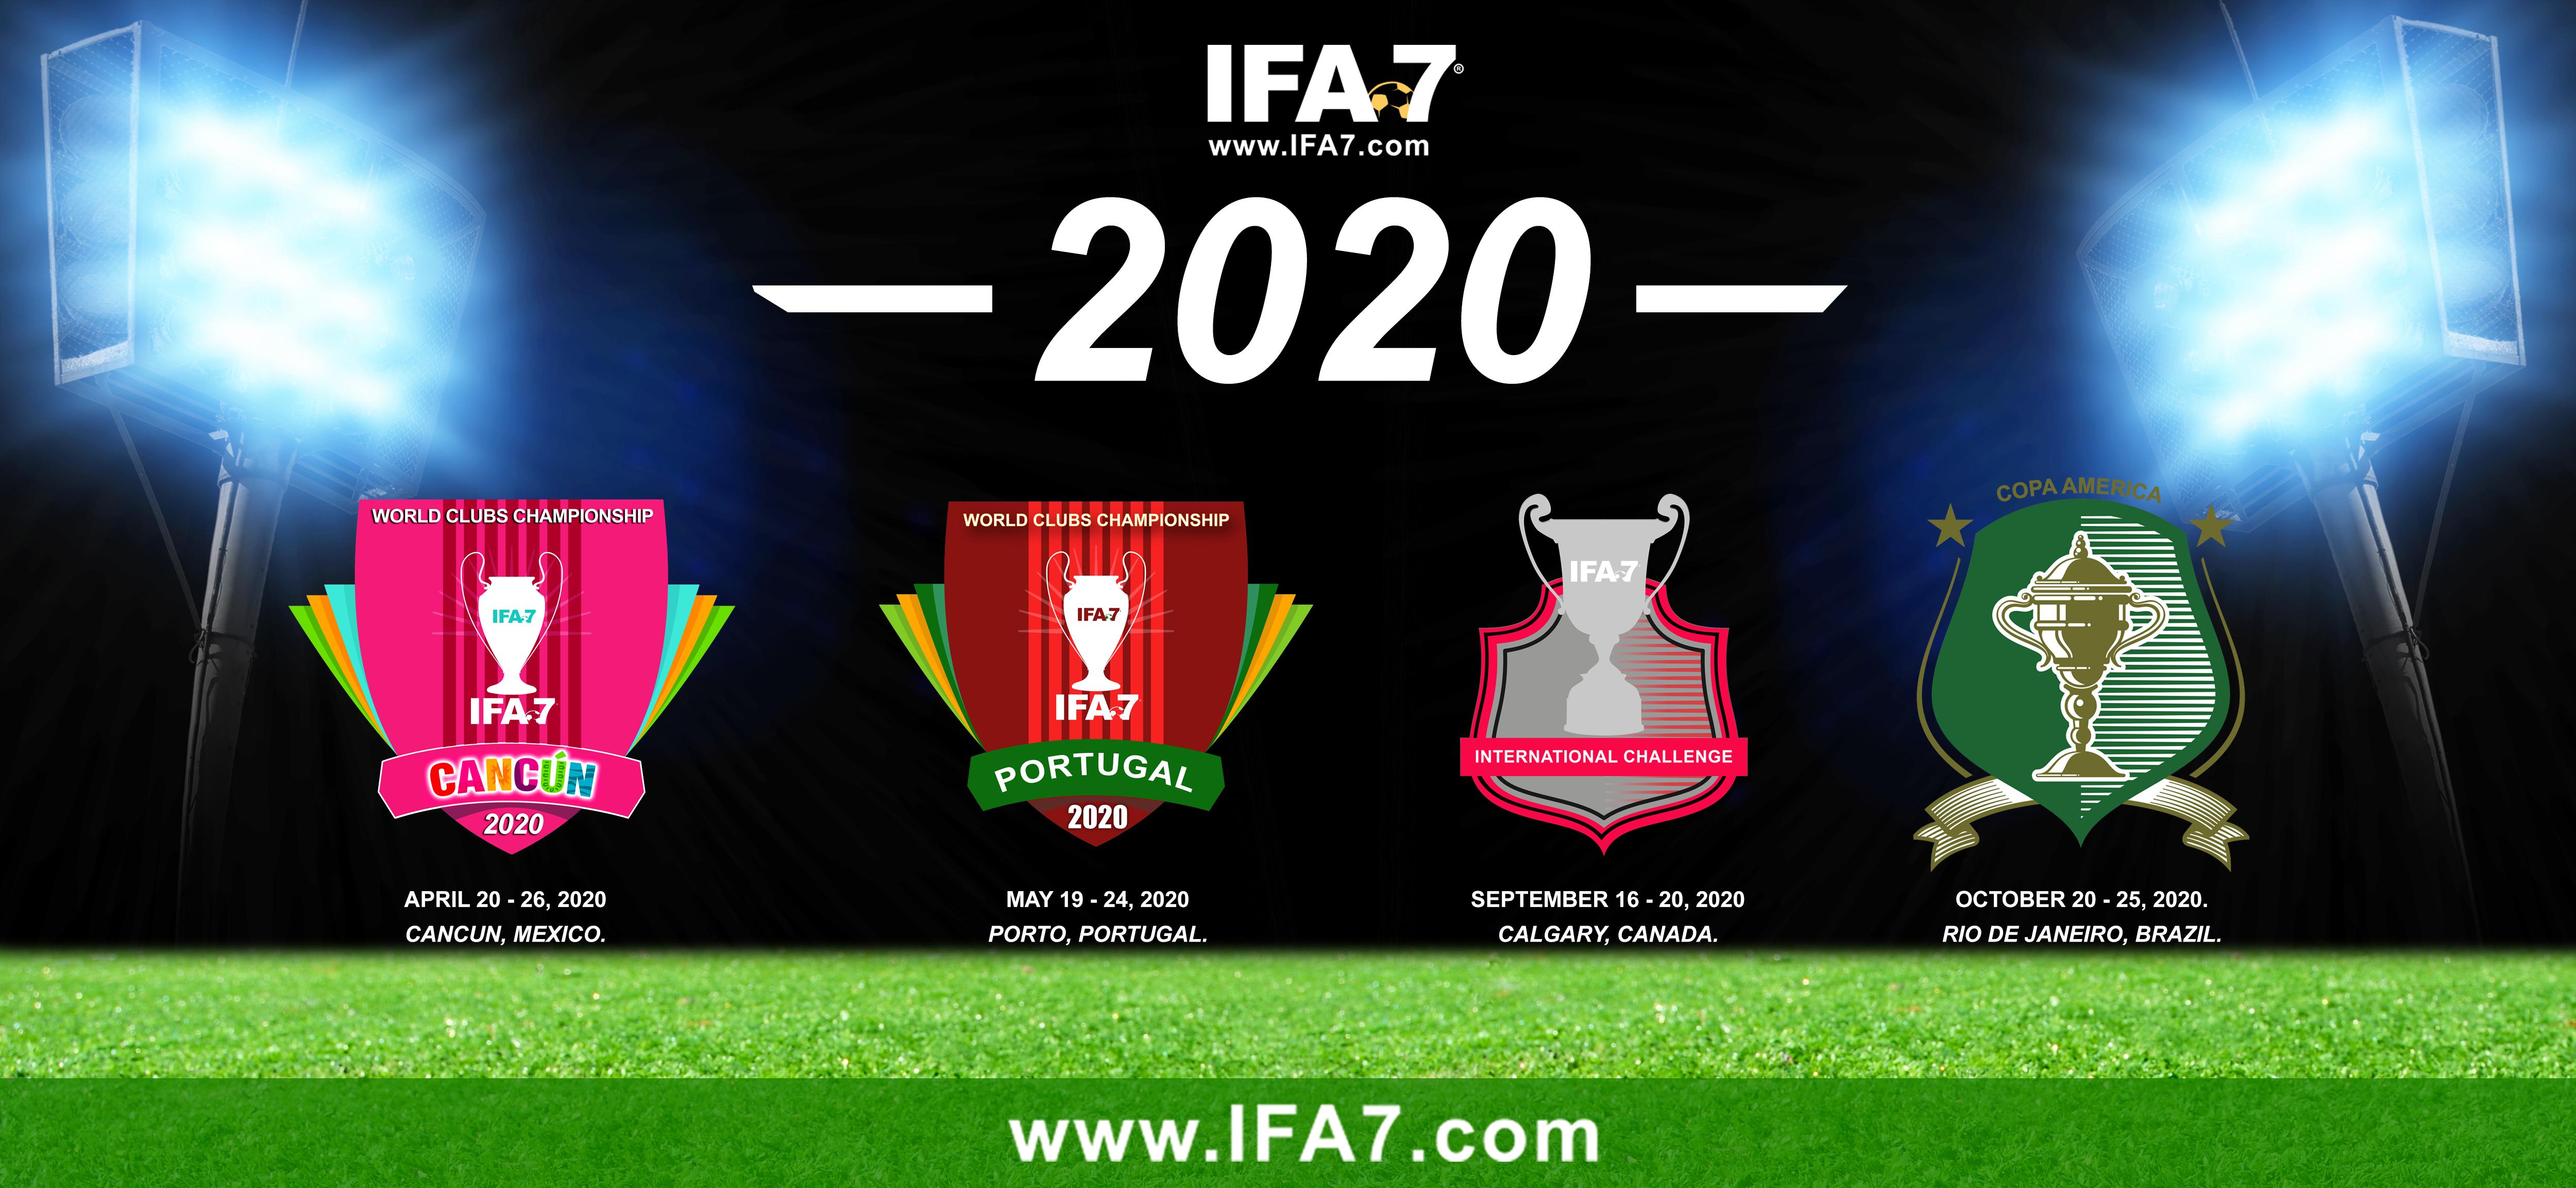 IFA7 2020 Events.